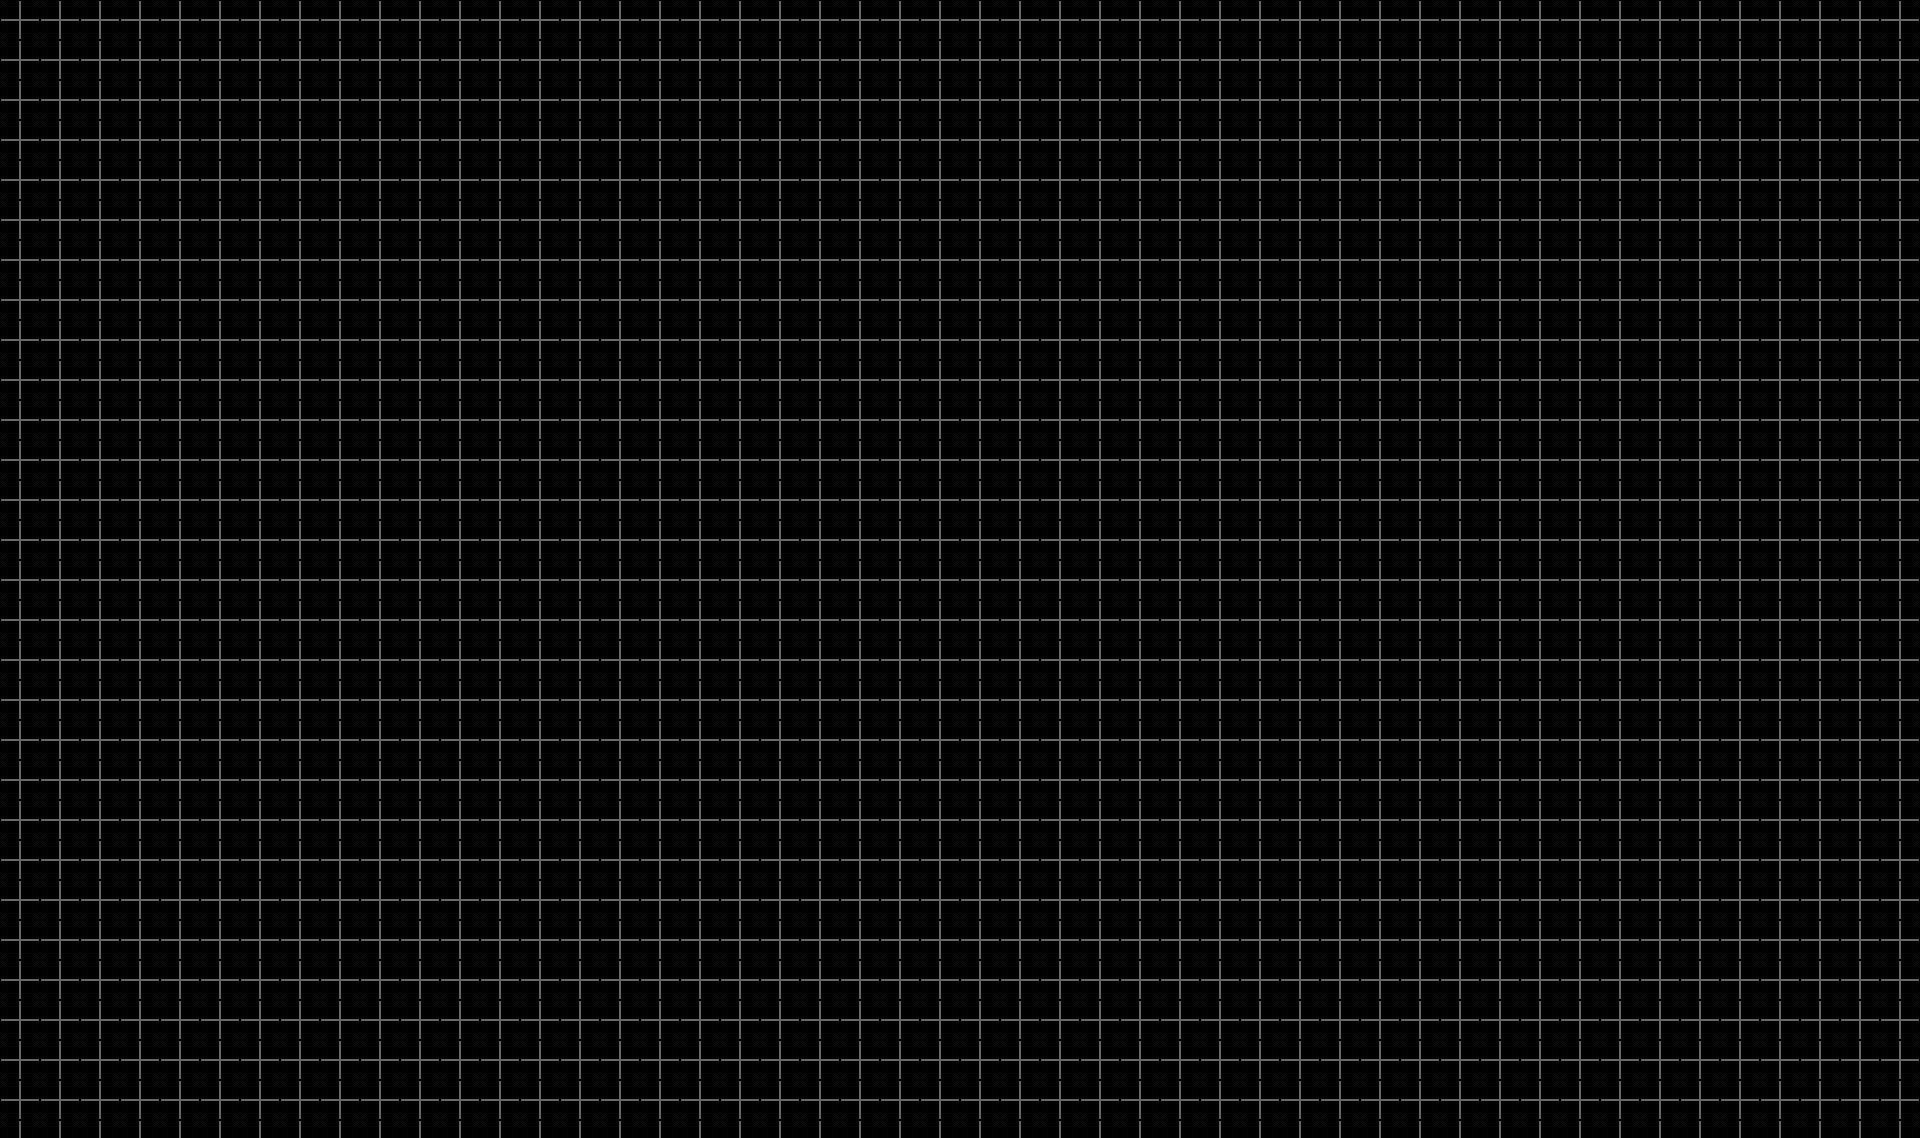 Aesthetic Grid Laptop Wallpapers   Top Aesthetic Grid Laptop 1920x1138